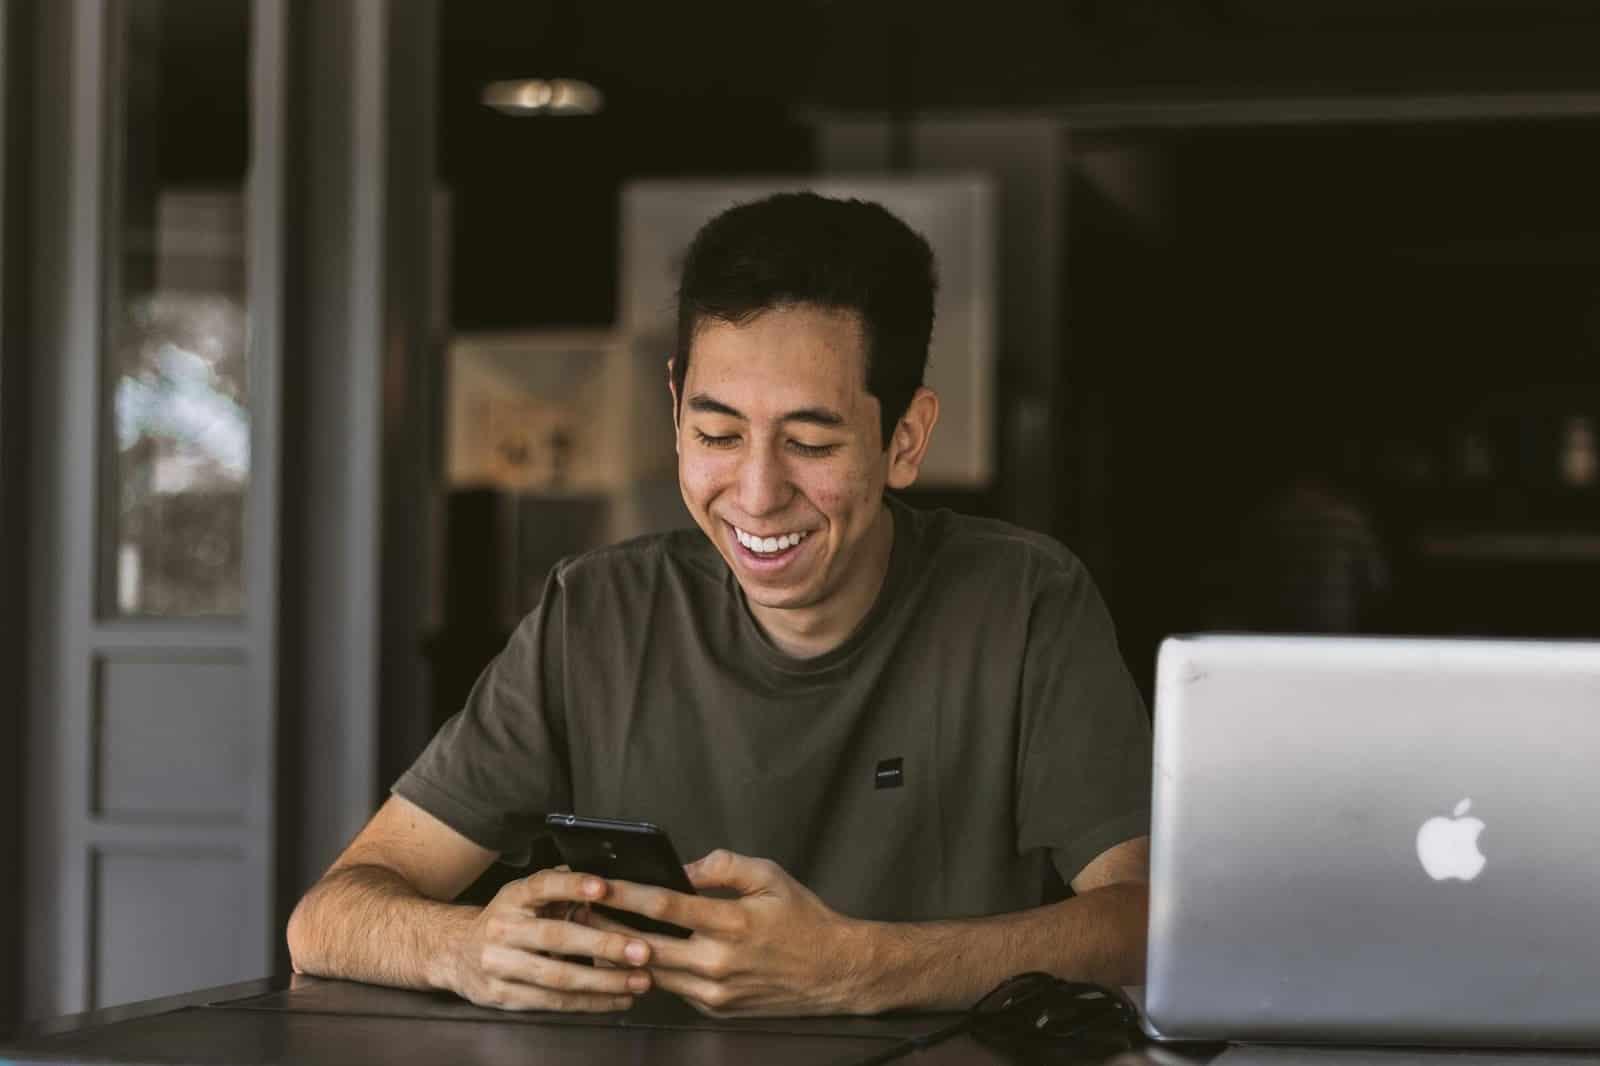 man smiling and checking phone